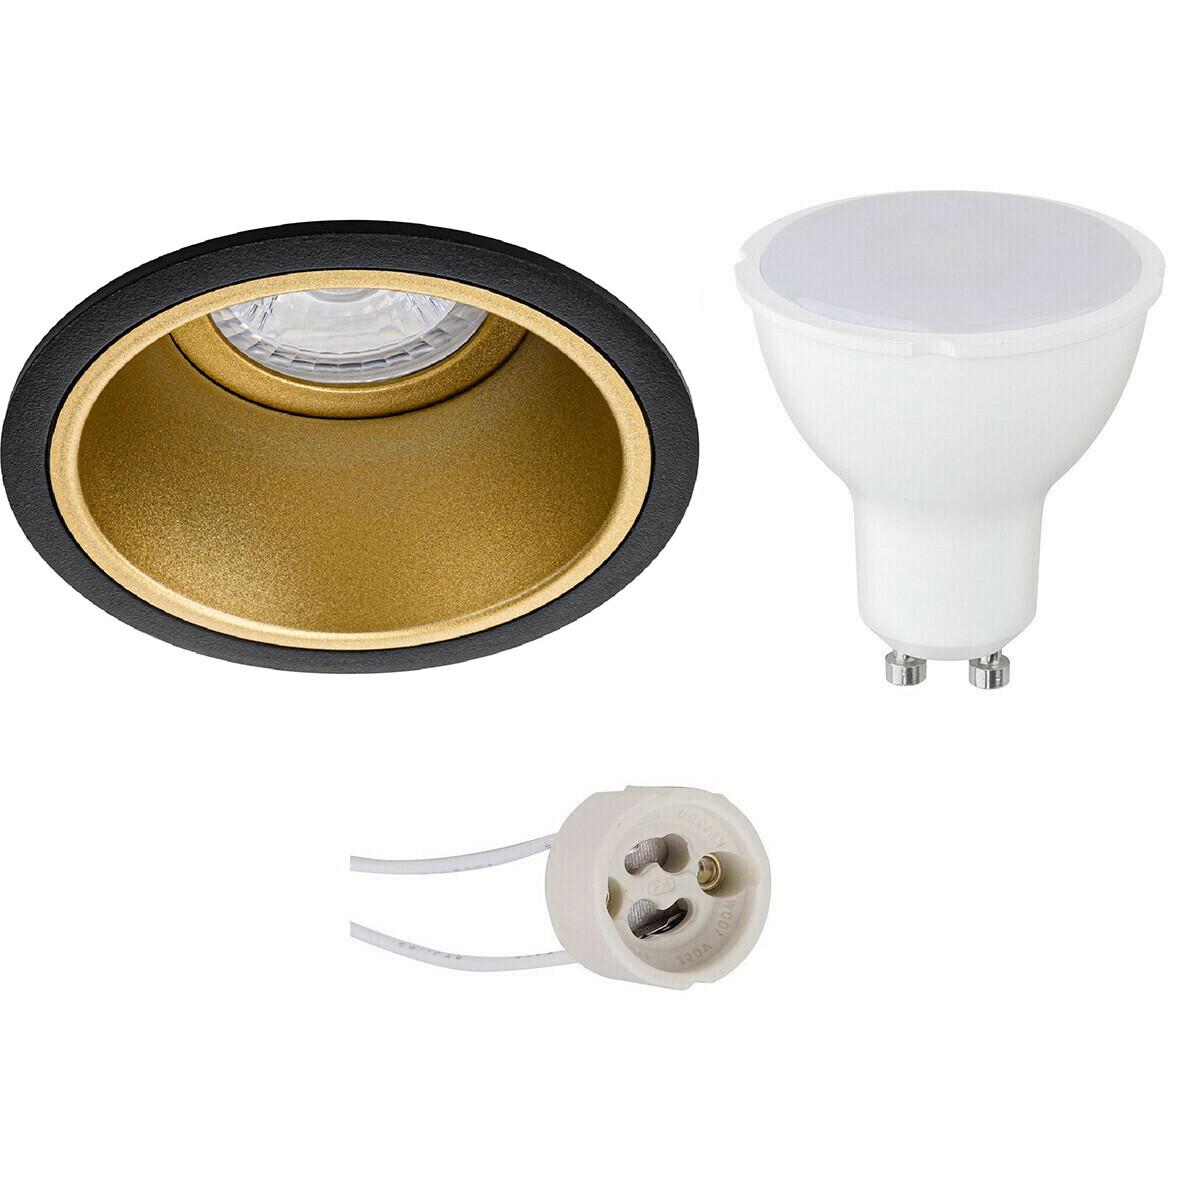 LED Spot Set - Aigi - Pragmi Minko Pro - GU10 Fitting - Inbouw Rond - Mat Zwart/Goud - 6W - Helder/K